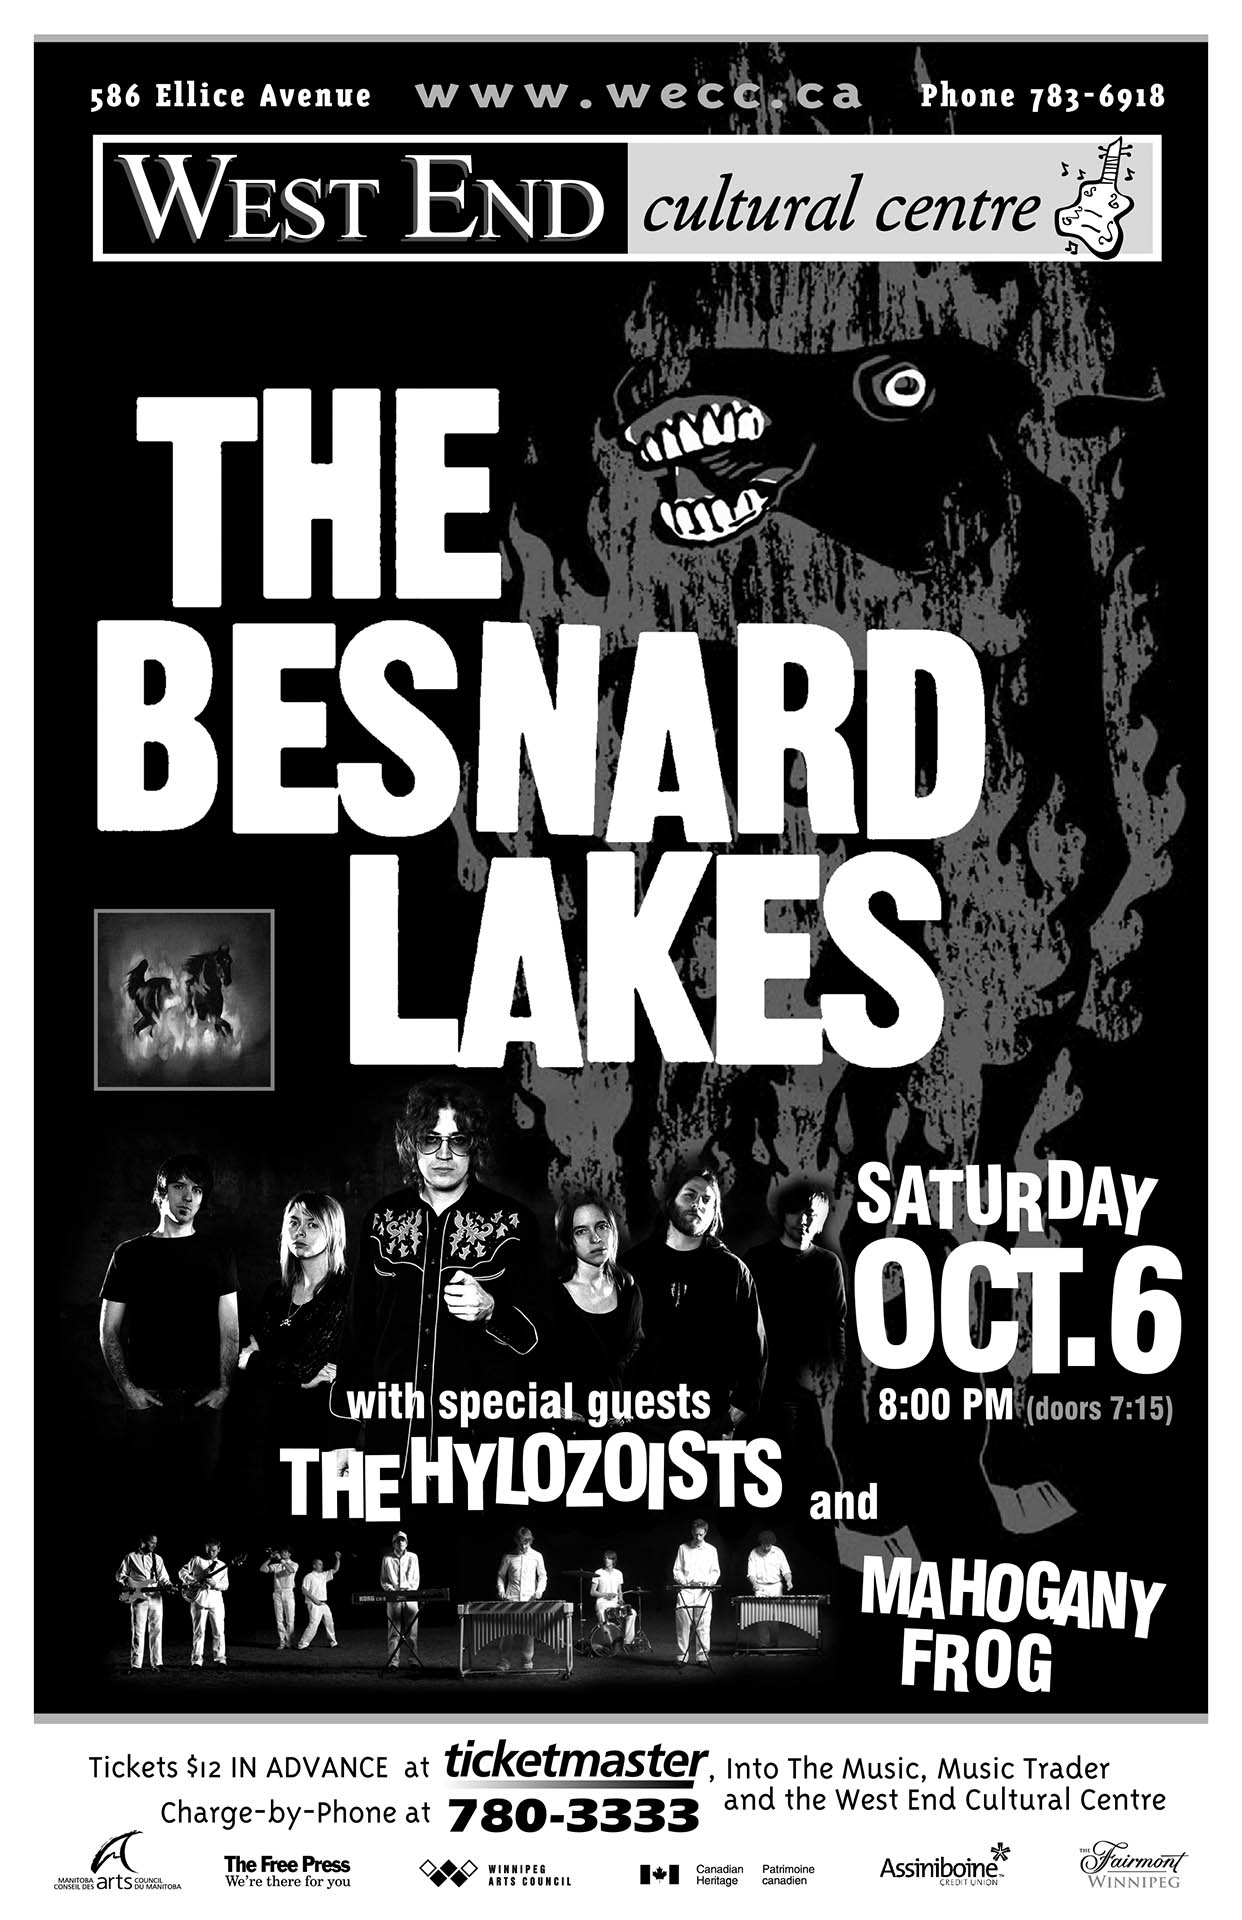 THE BESNARD LAKES – 2007